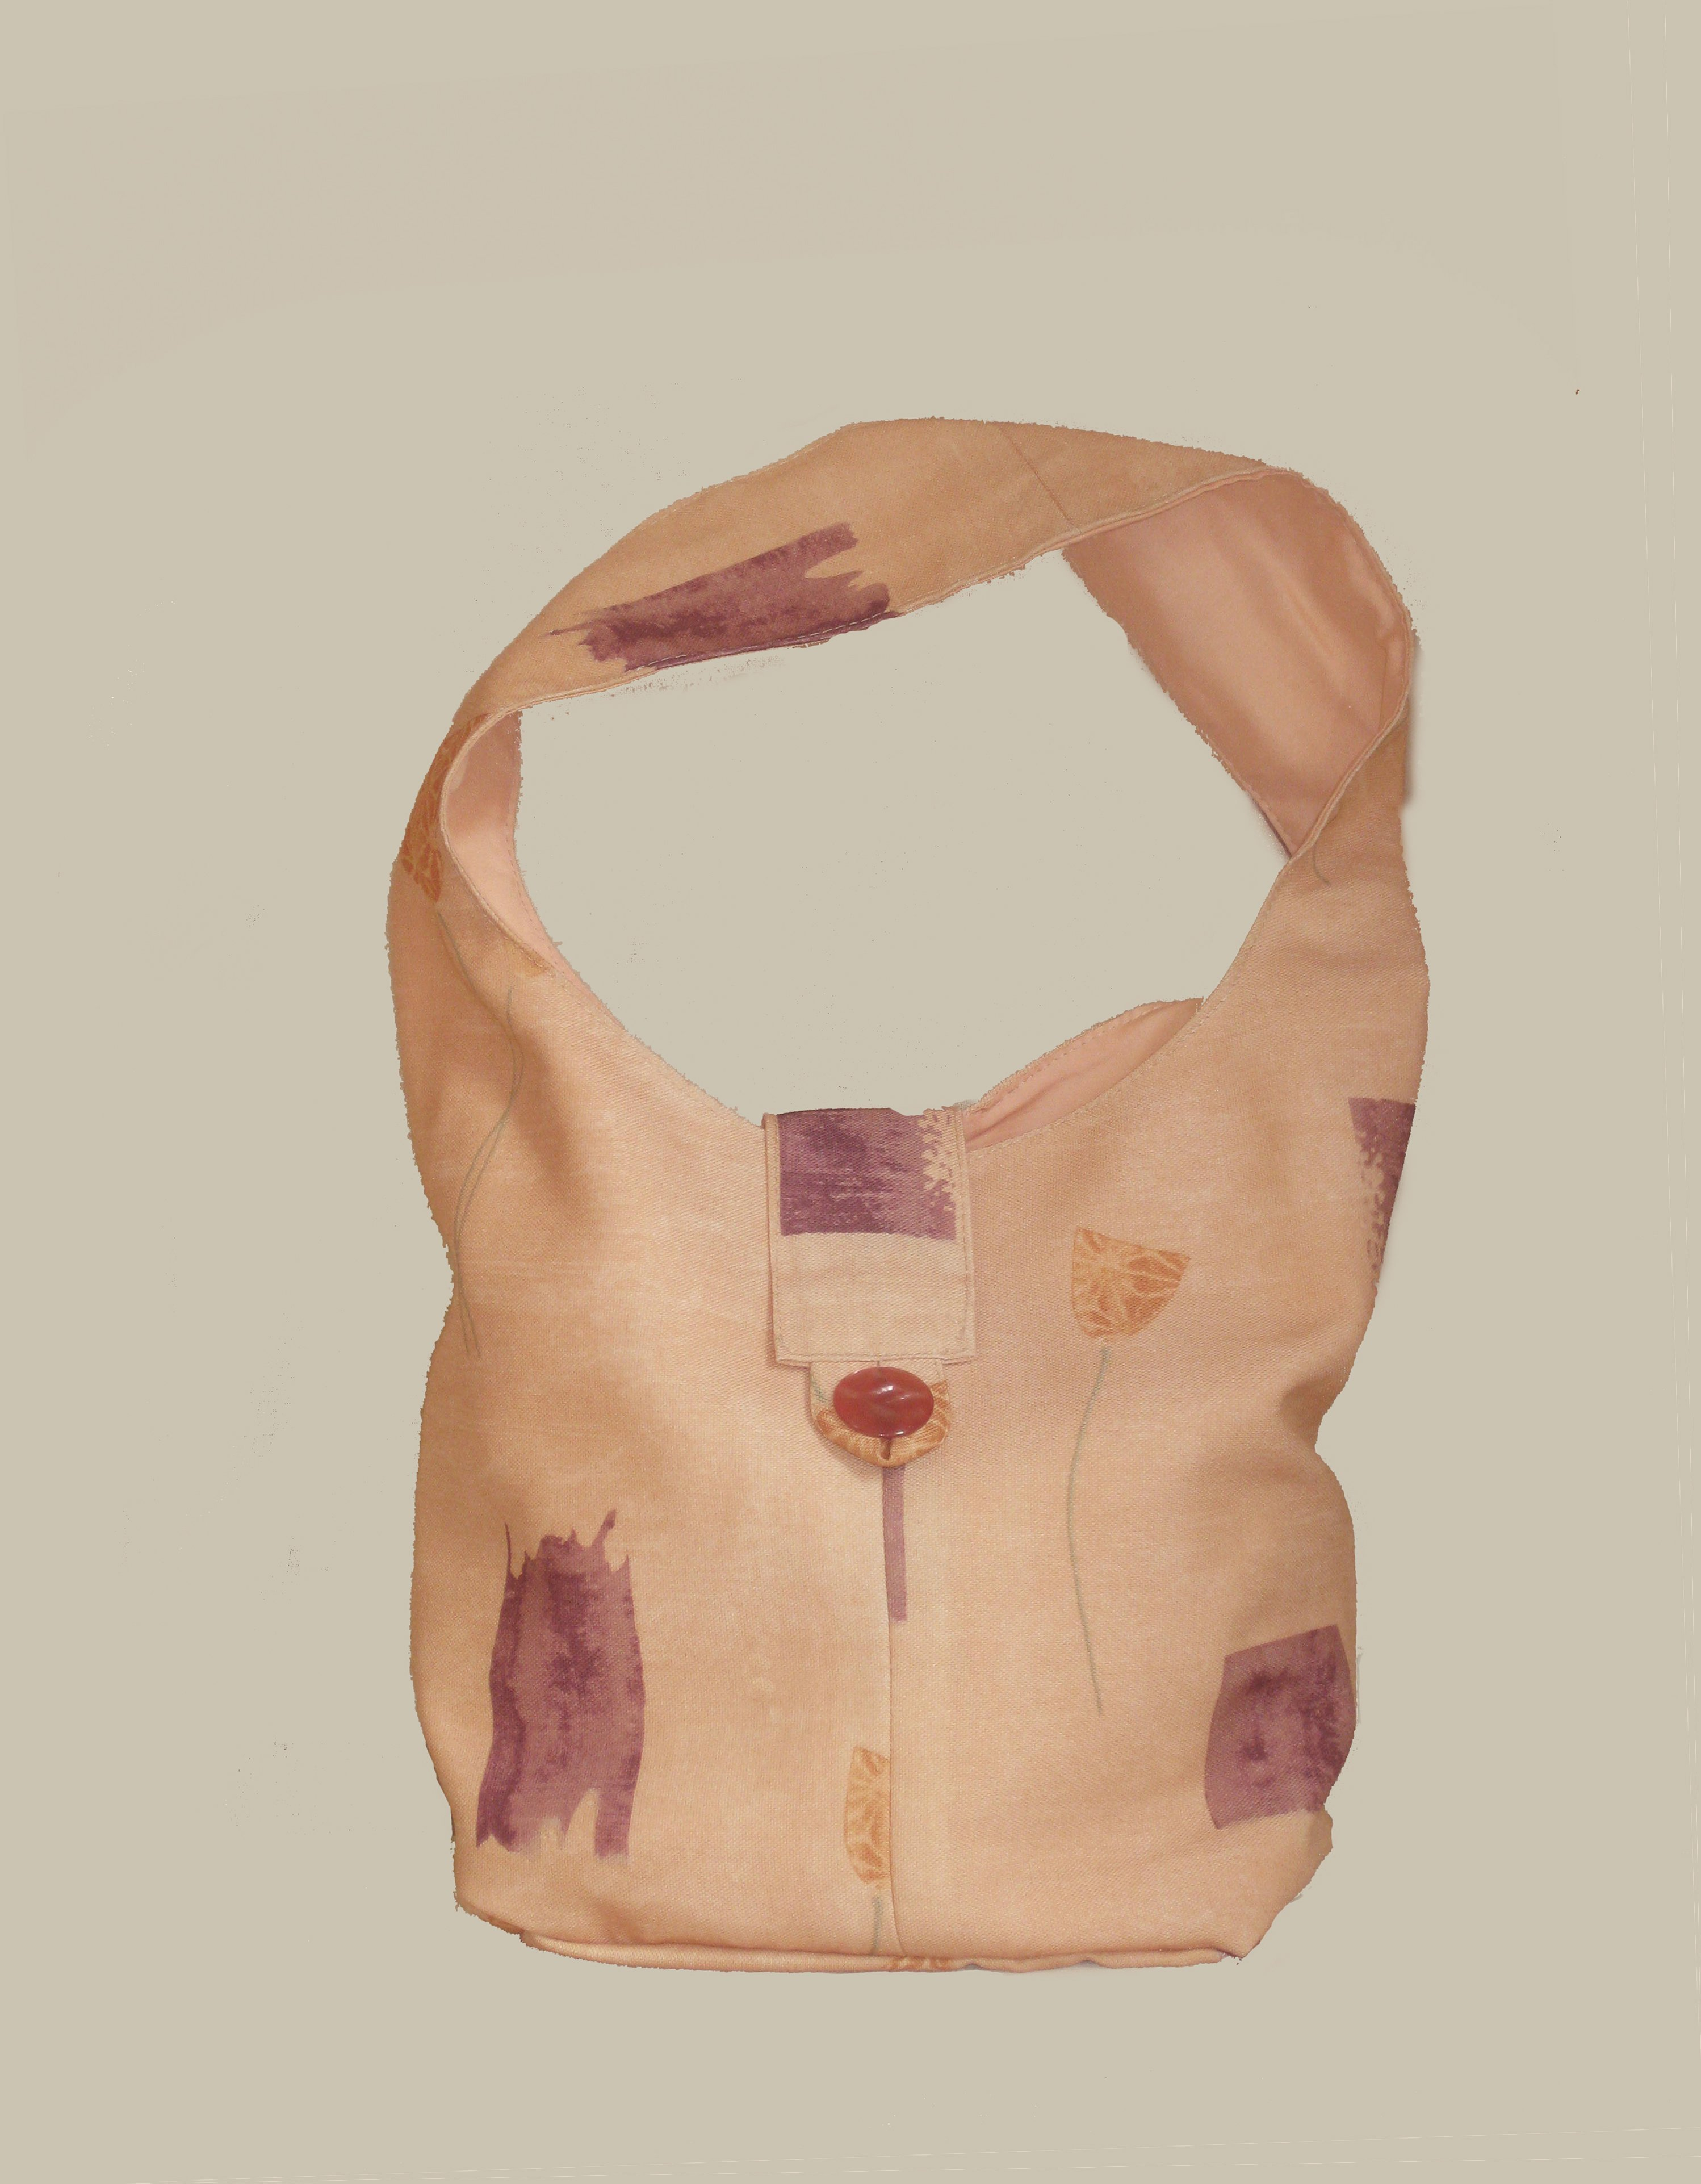 Apricot handmade handbag -one of a kind